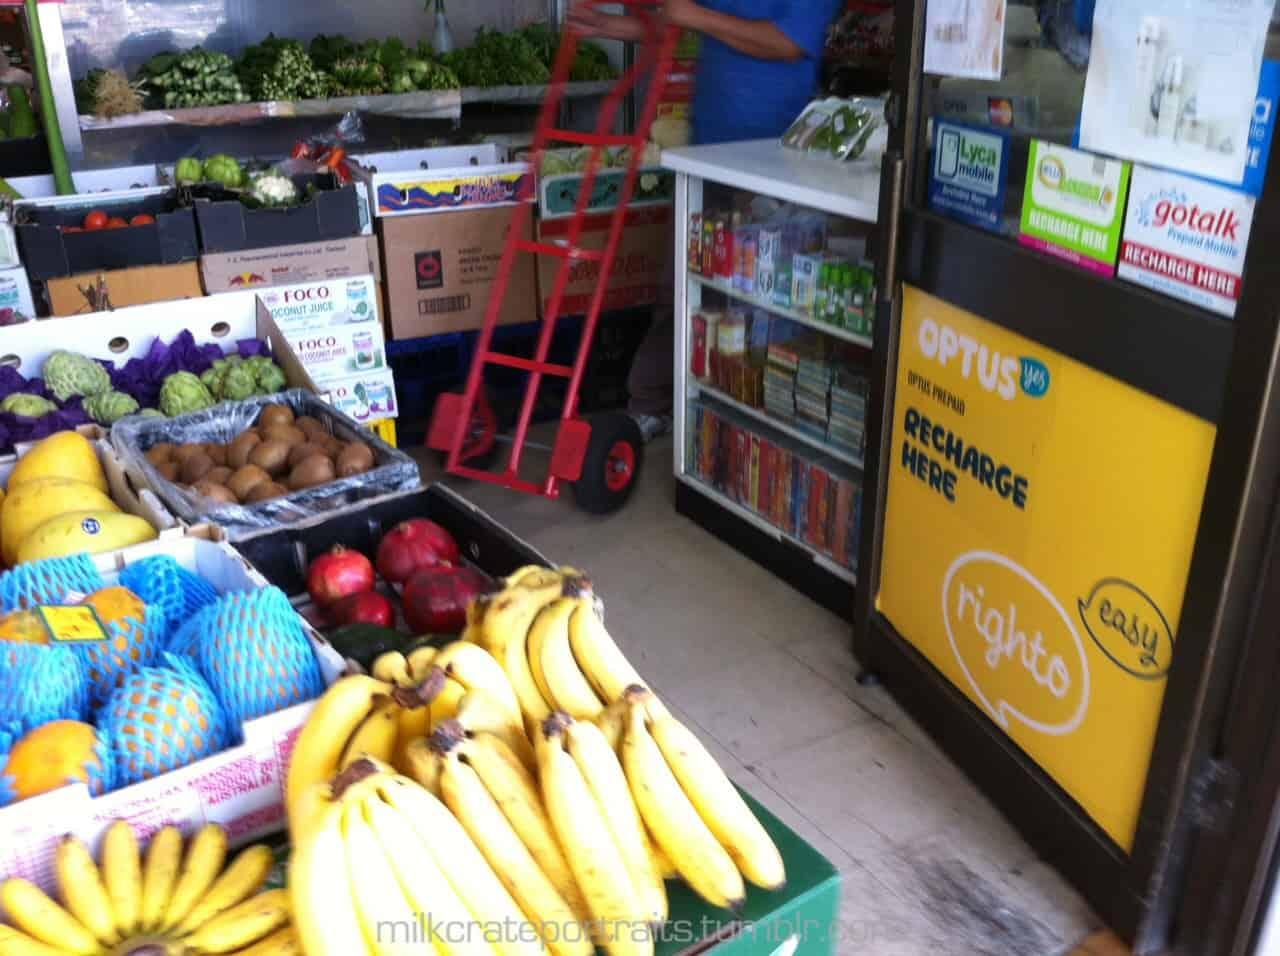 Fruit shop milk crates